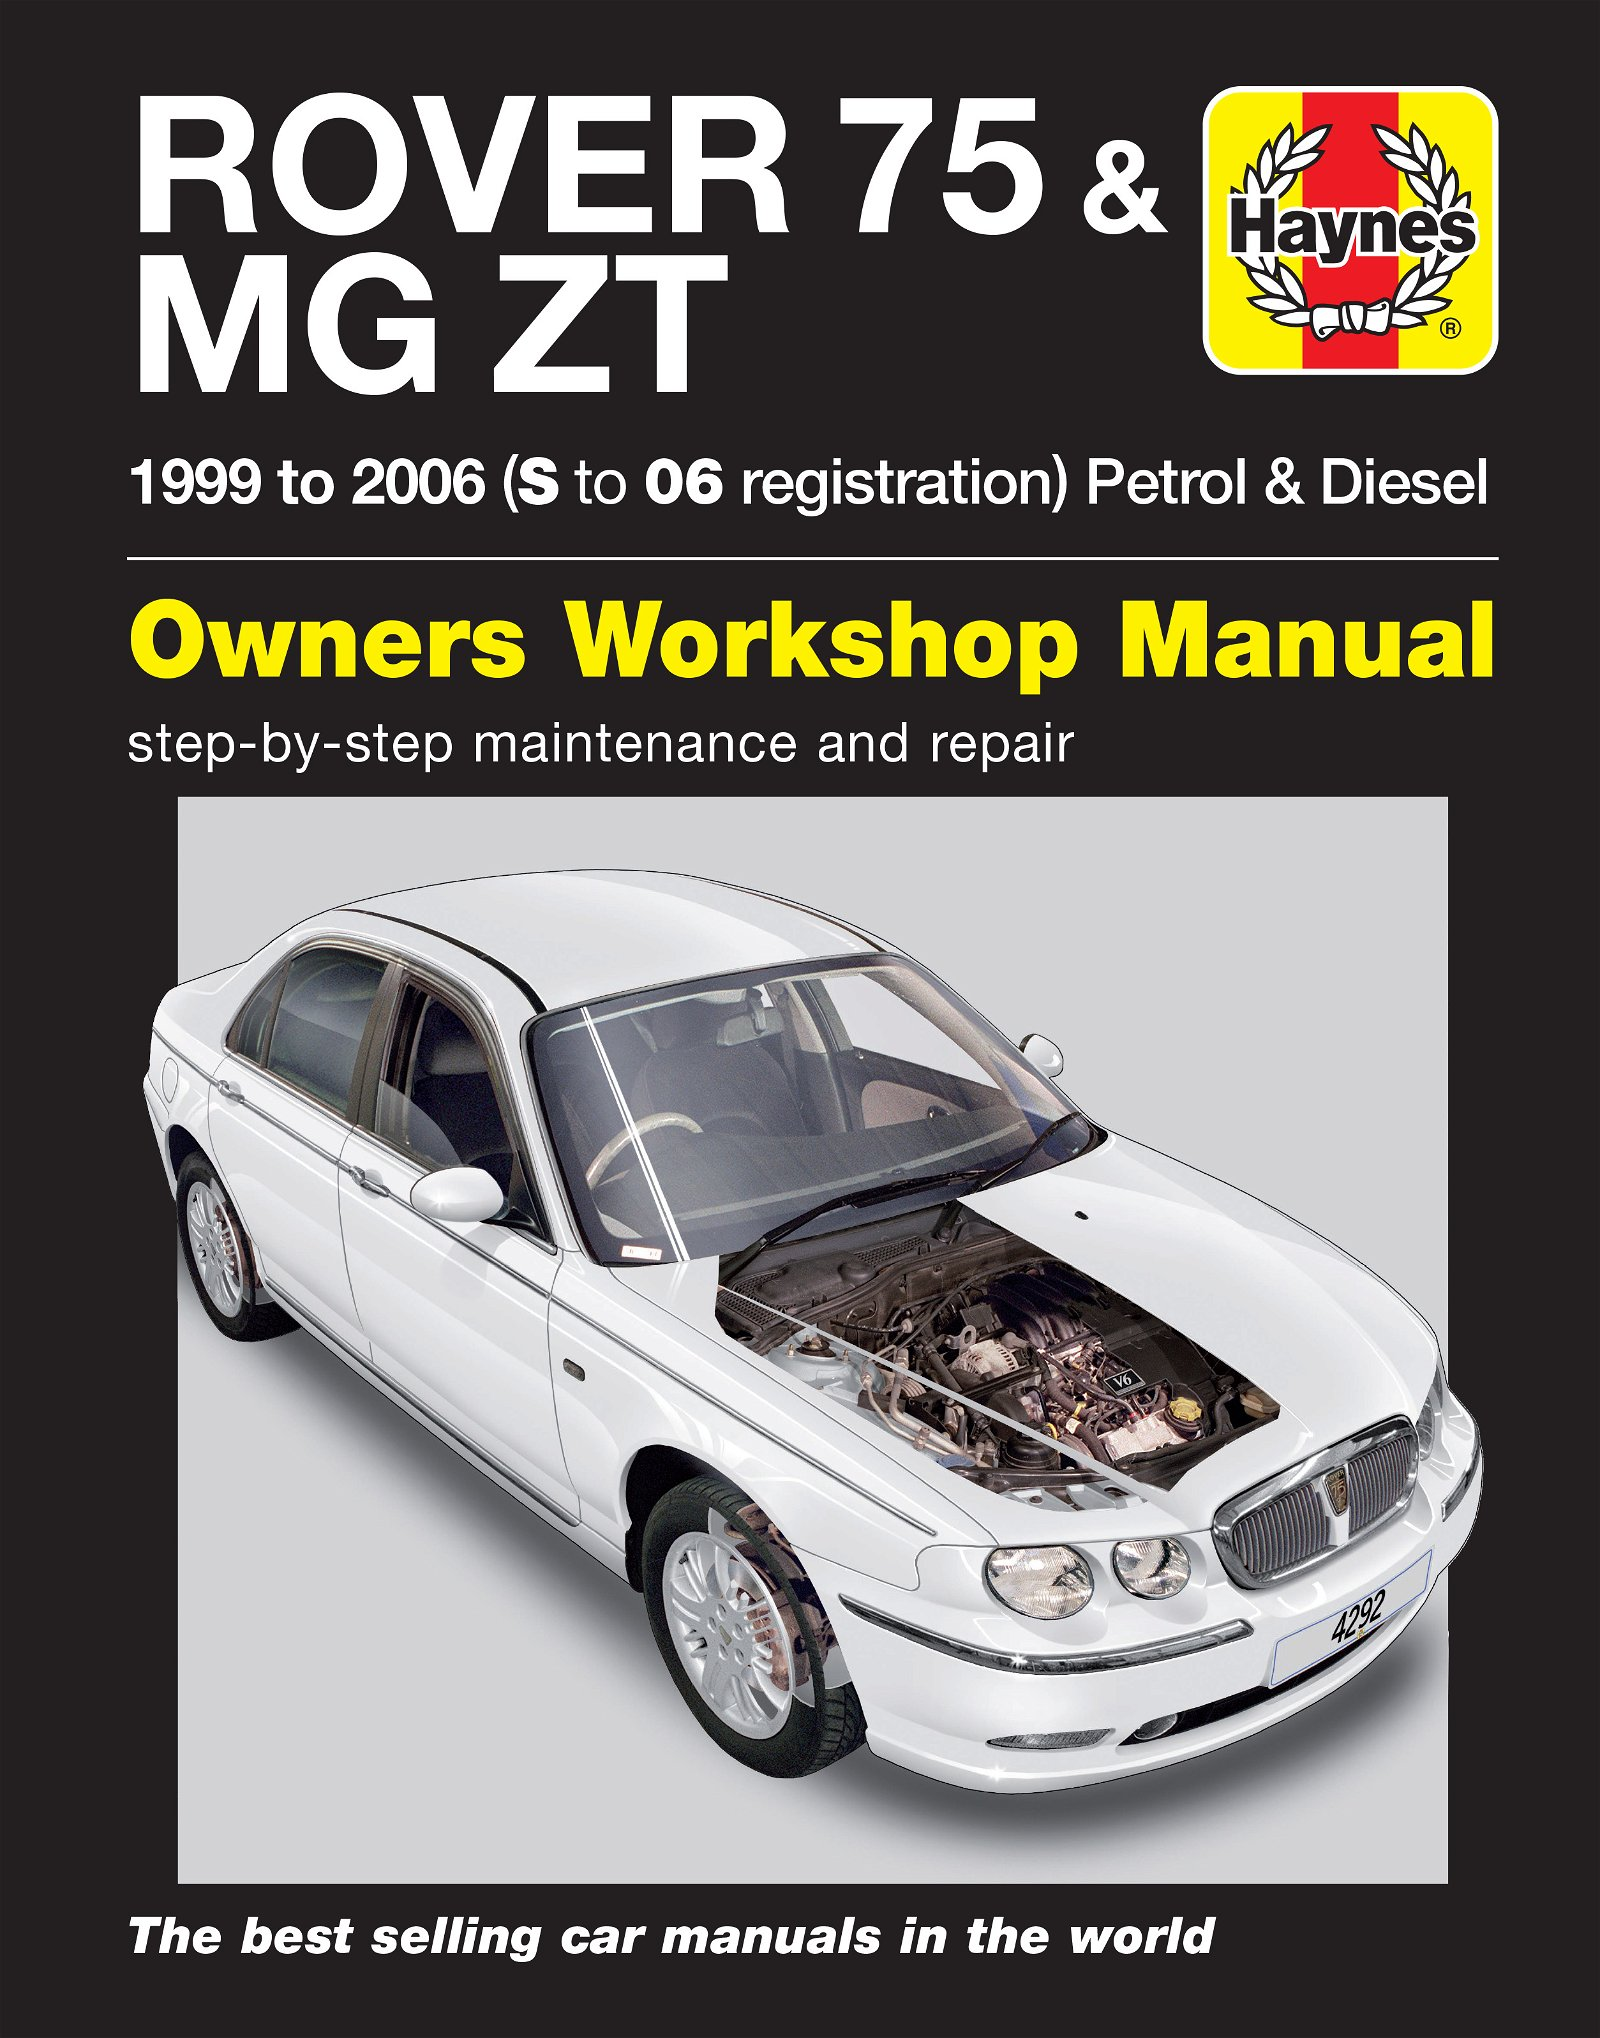 [Manuel UK en Anglais] Rover 75 / MG ZT Petrol & Diesel  (99 - 06)   S to 06